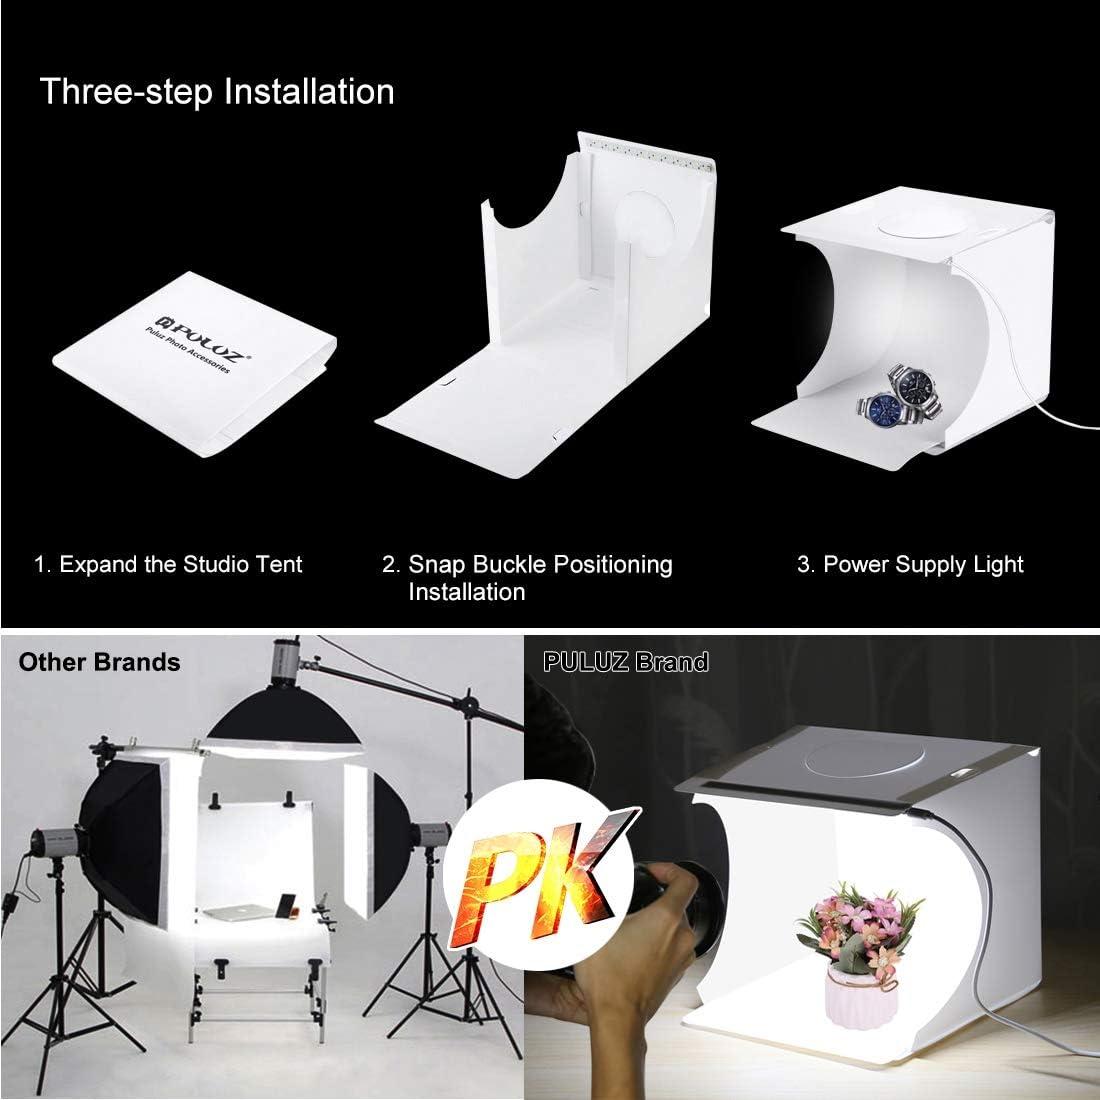 White Folding Lighting Softbox with 20 LED Lights 6 Backdrops for Product Display PULUZ 20cm Portable Photography Shooting Light Tent Kit Mini Photo Studio Box